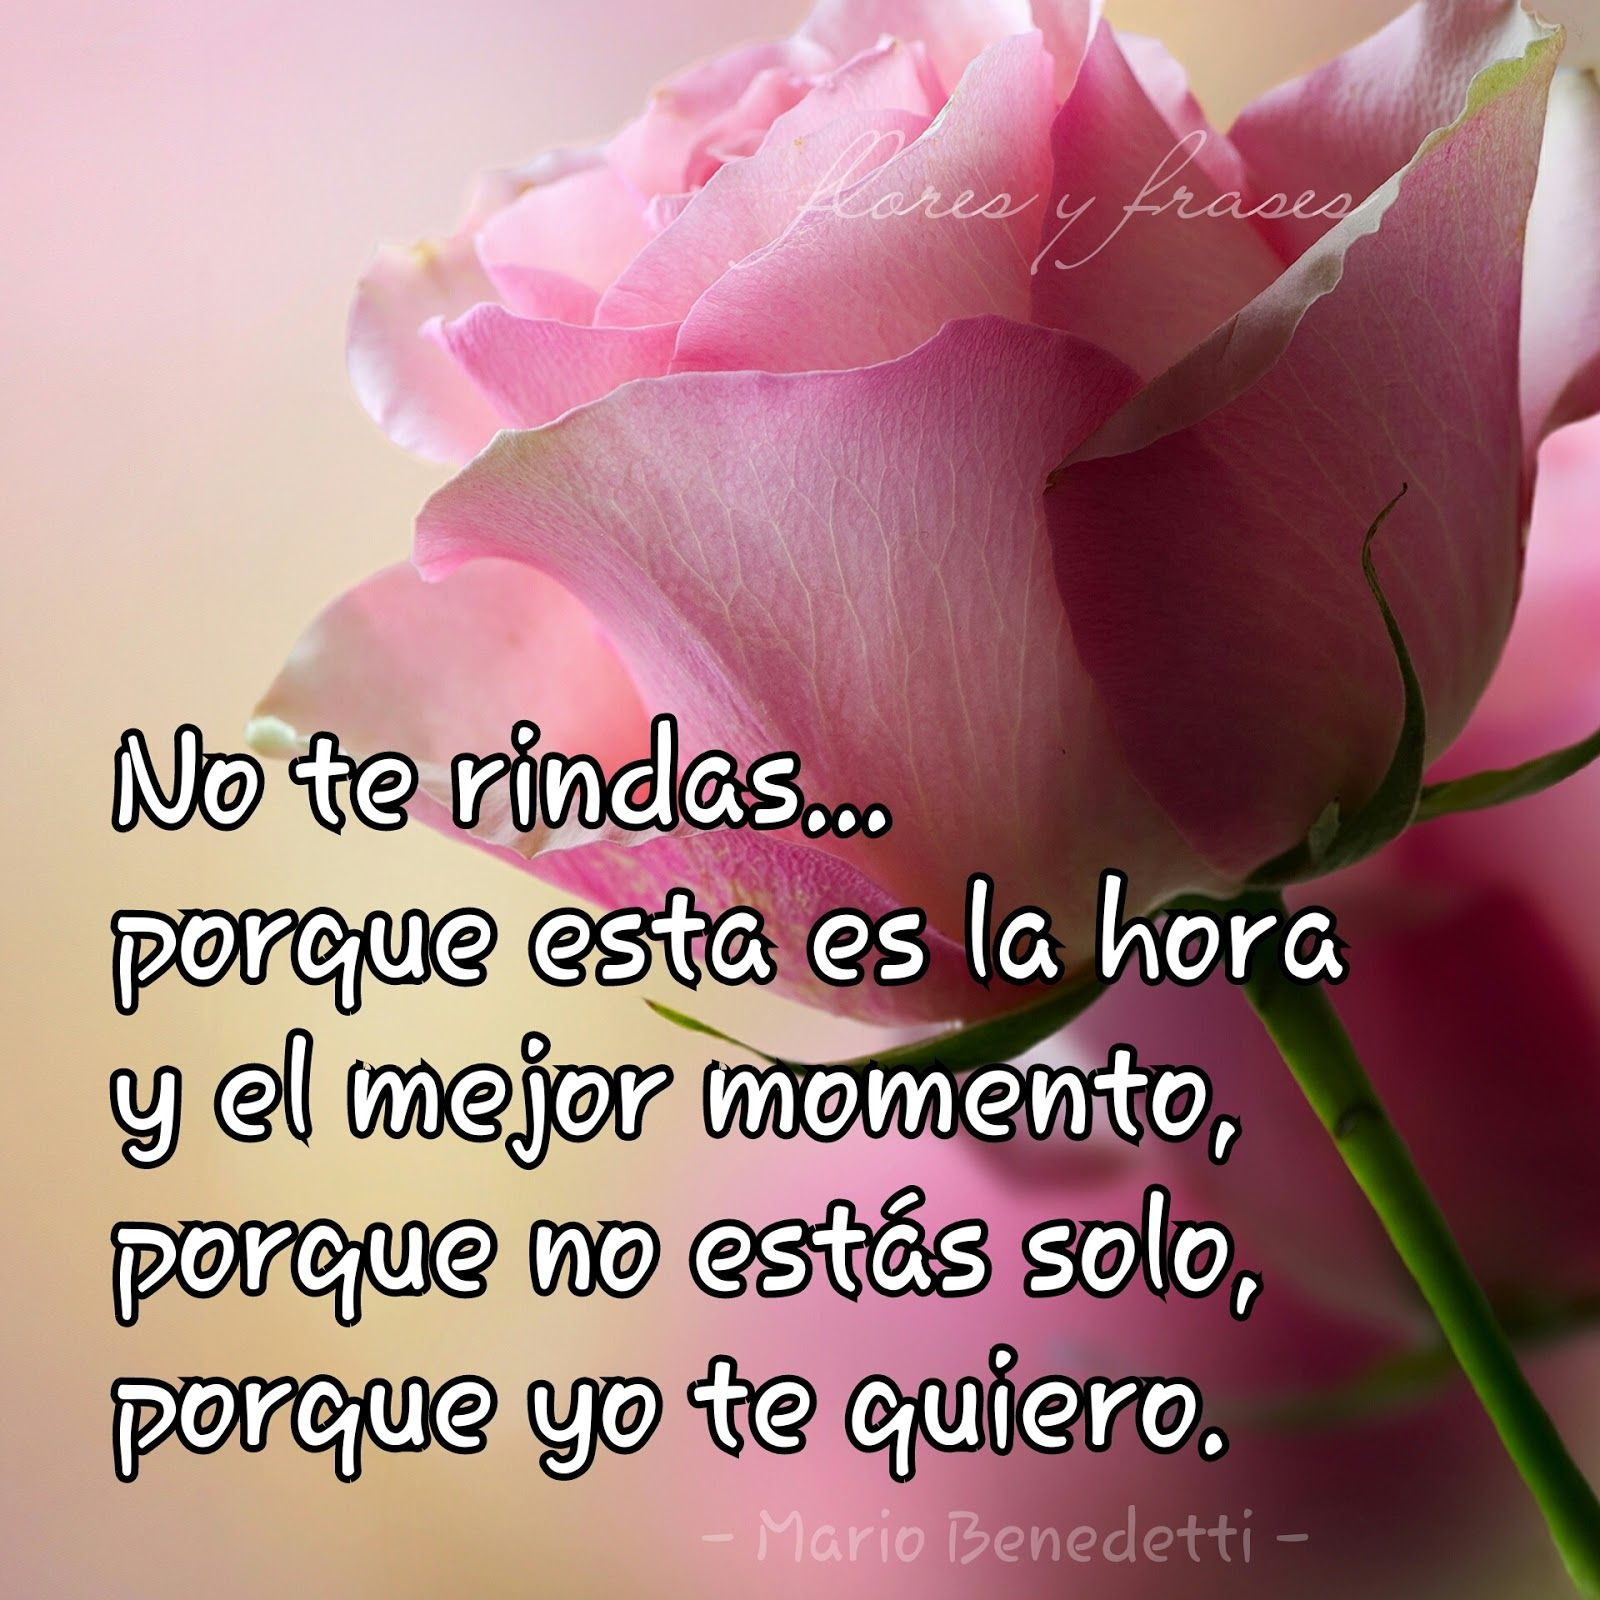 Flores Y Frases Frases De Amor De Mario Benedetti Amor Frases